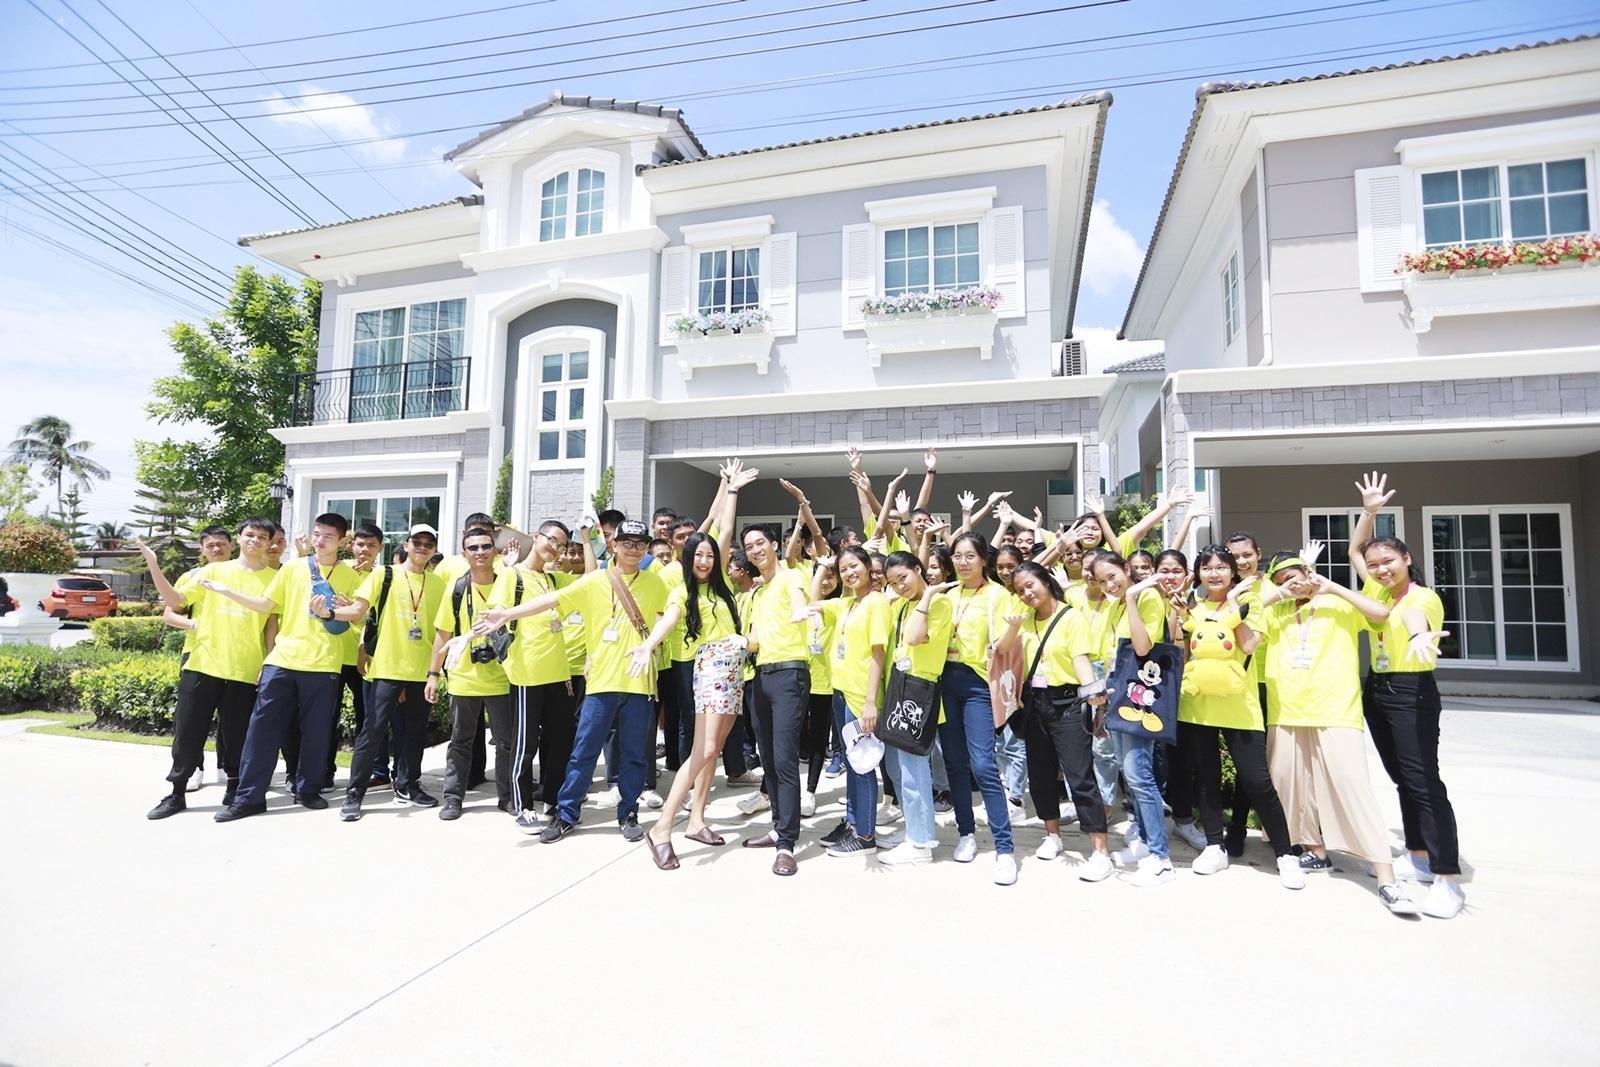 Gold Giving โครงการสนับสนุนด้านการศึกษาจาก Golden Land